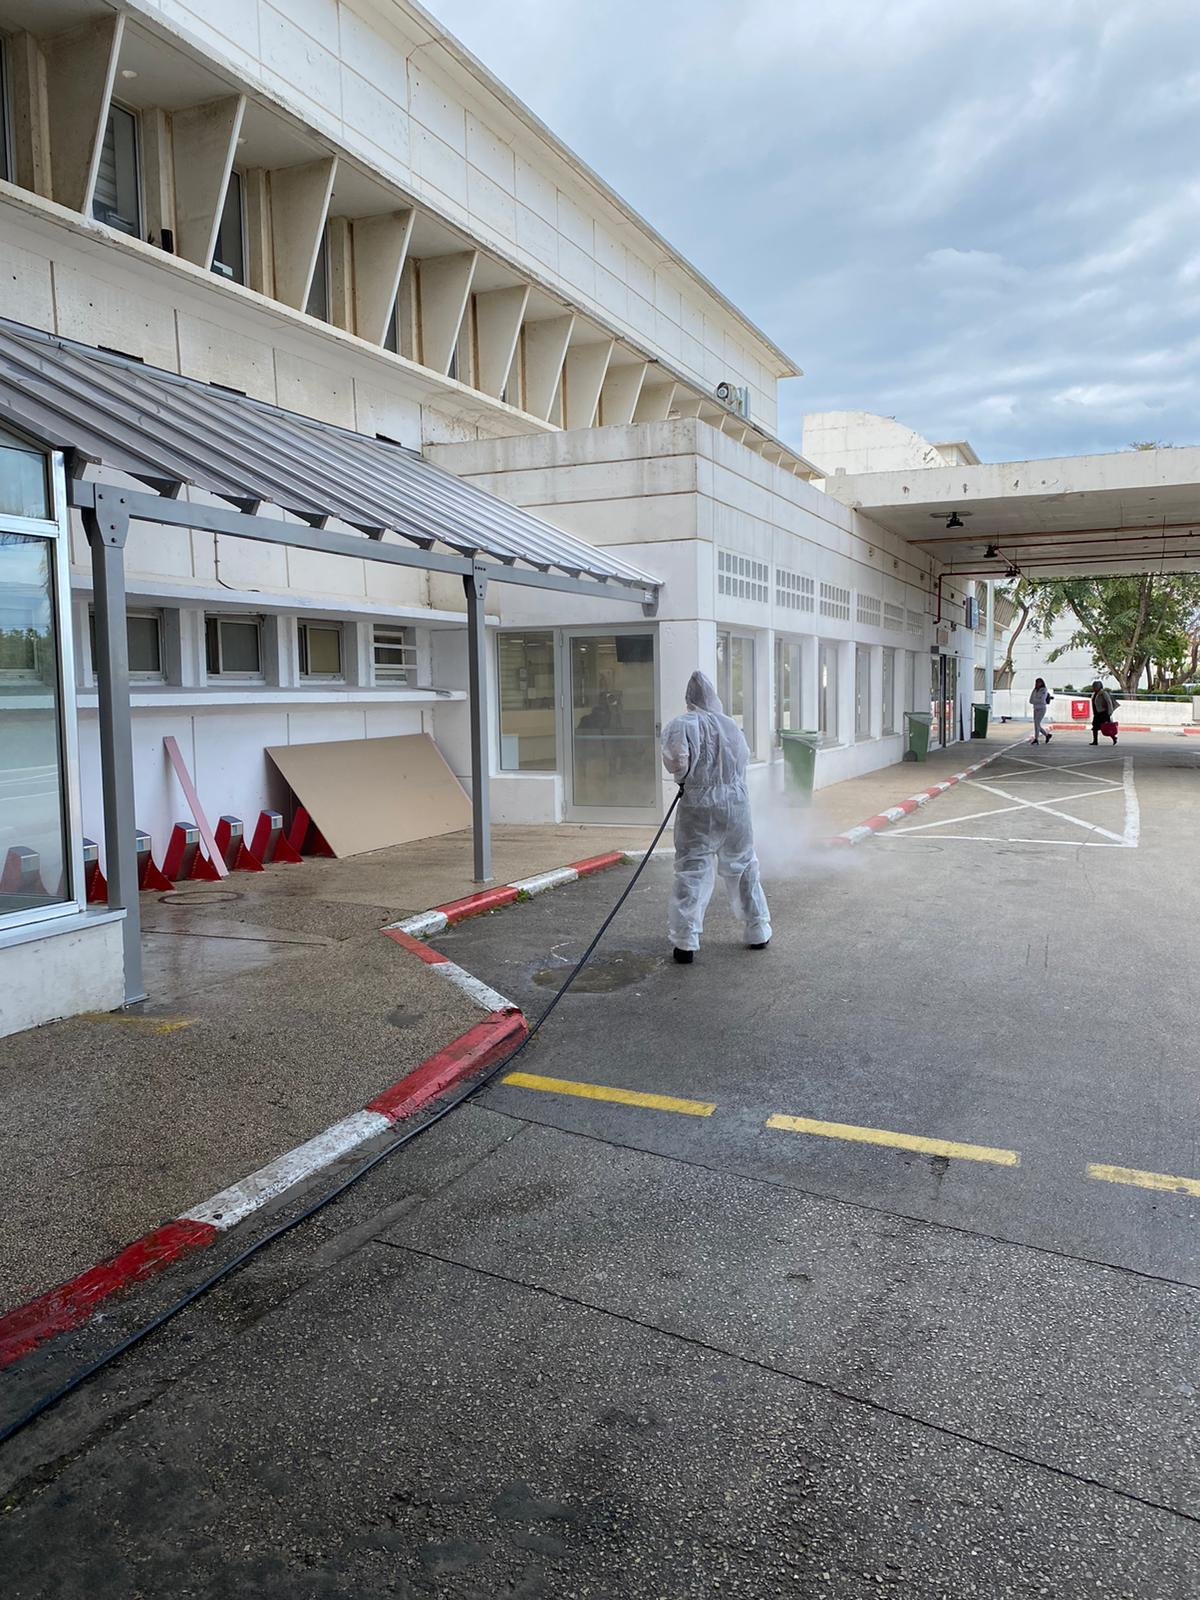 Photo of צפו: בתי החולים וולפסון ואיכילוב ומתחם דרייב אין – אלה שלושת המקומות שחוטאו לטובת התמודדדות עם הקורונה